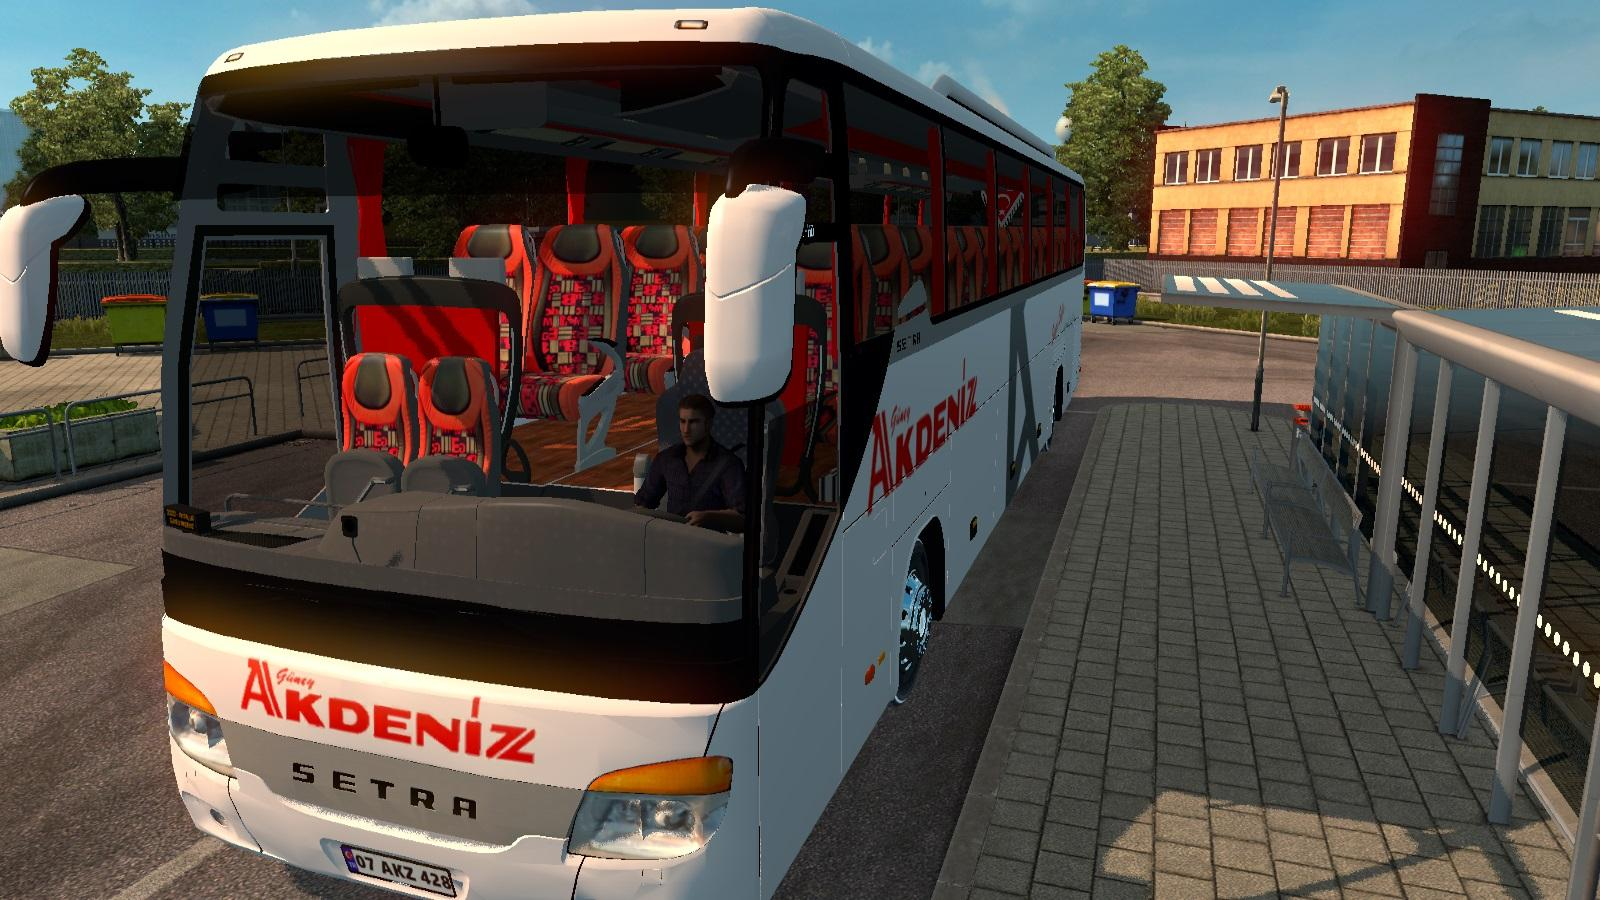 setra-416-gt-gney-akdeniz-tourism-skin-1-0_1